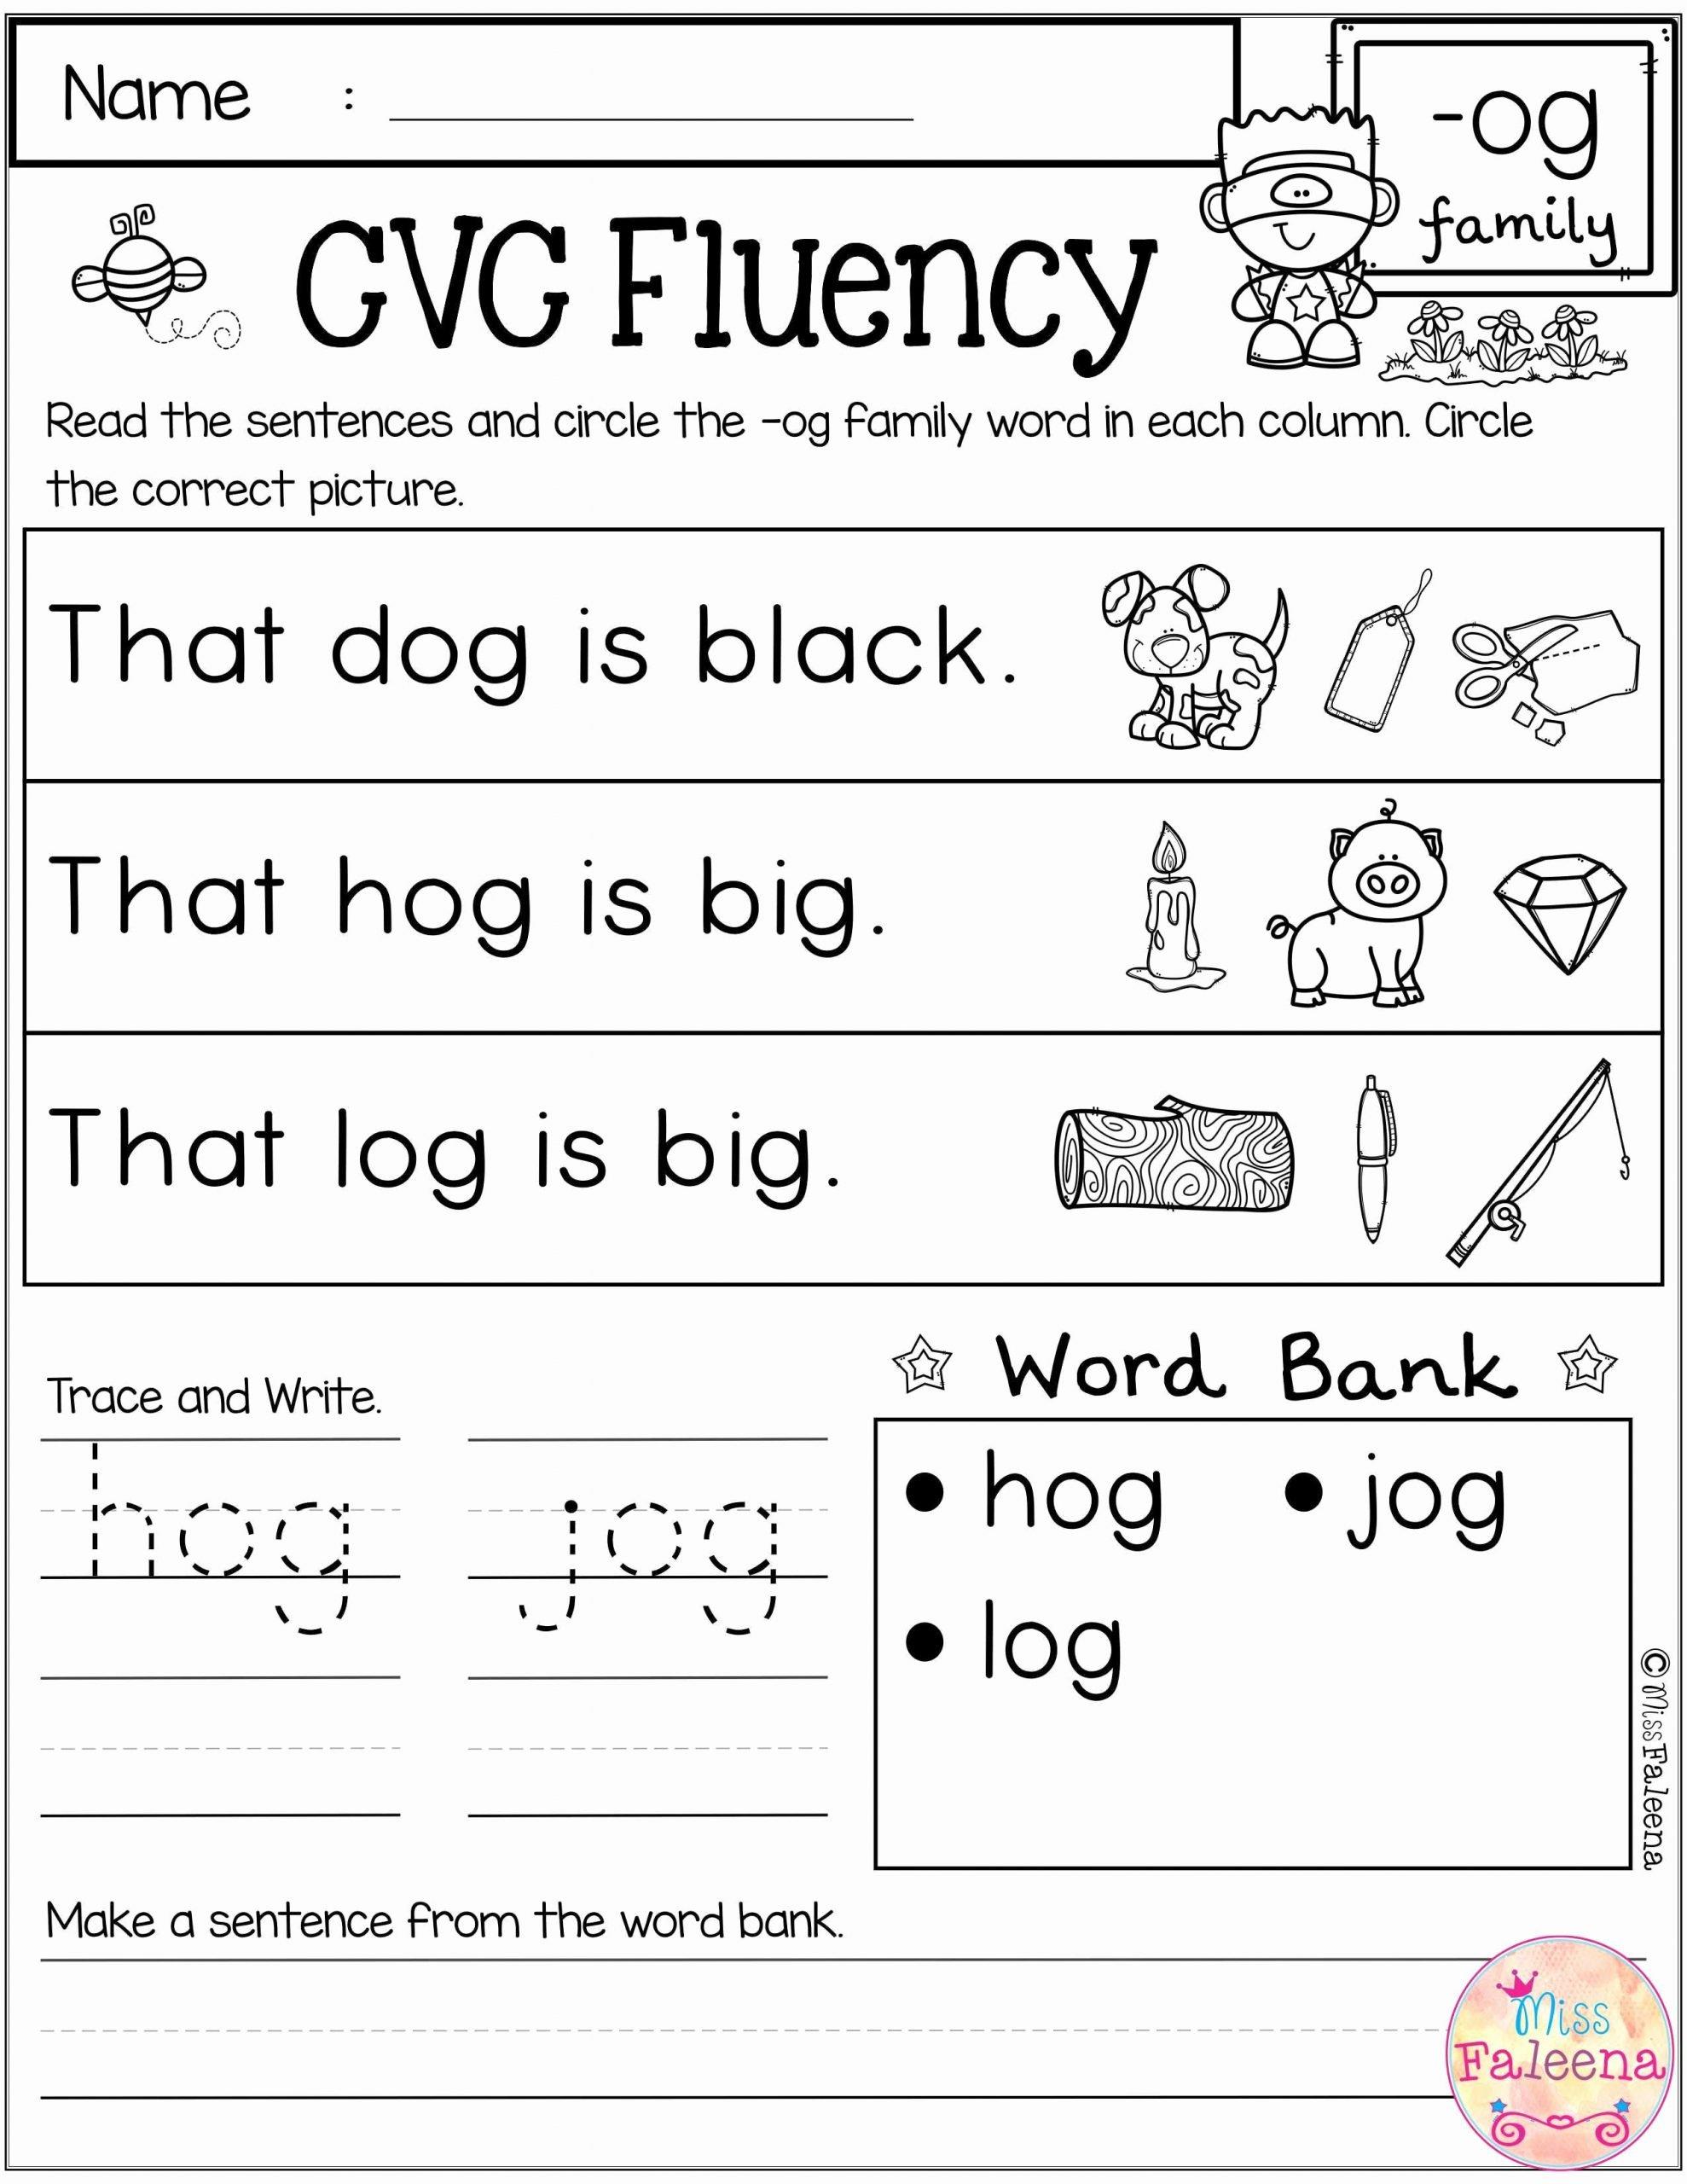 Cvc Worksheets for First Grade Best Of Free Cvc Fluency